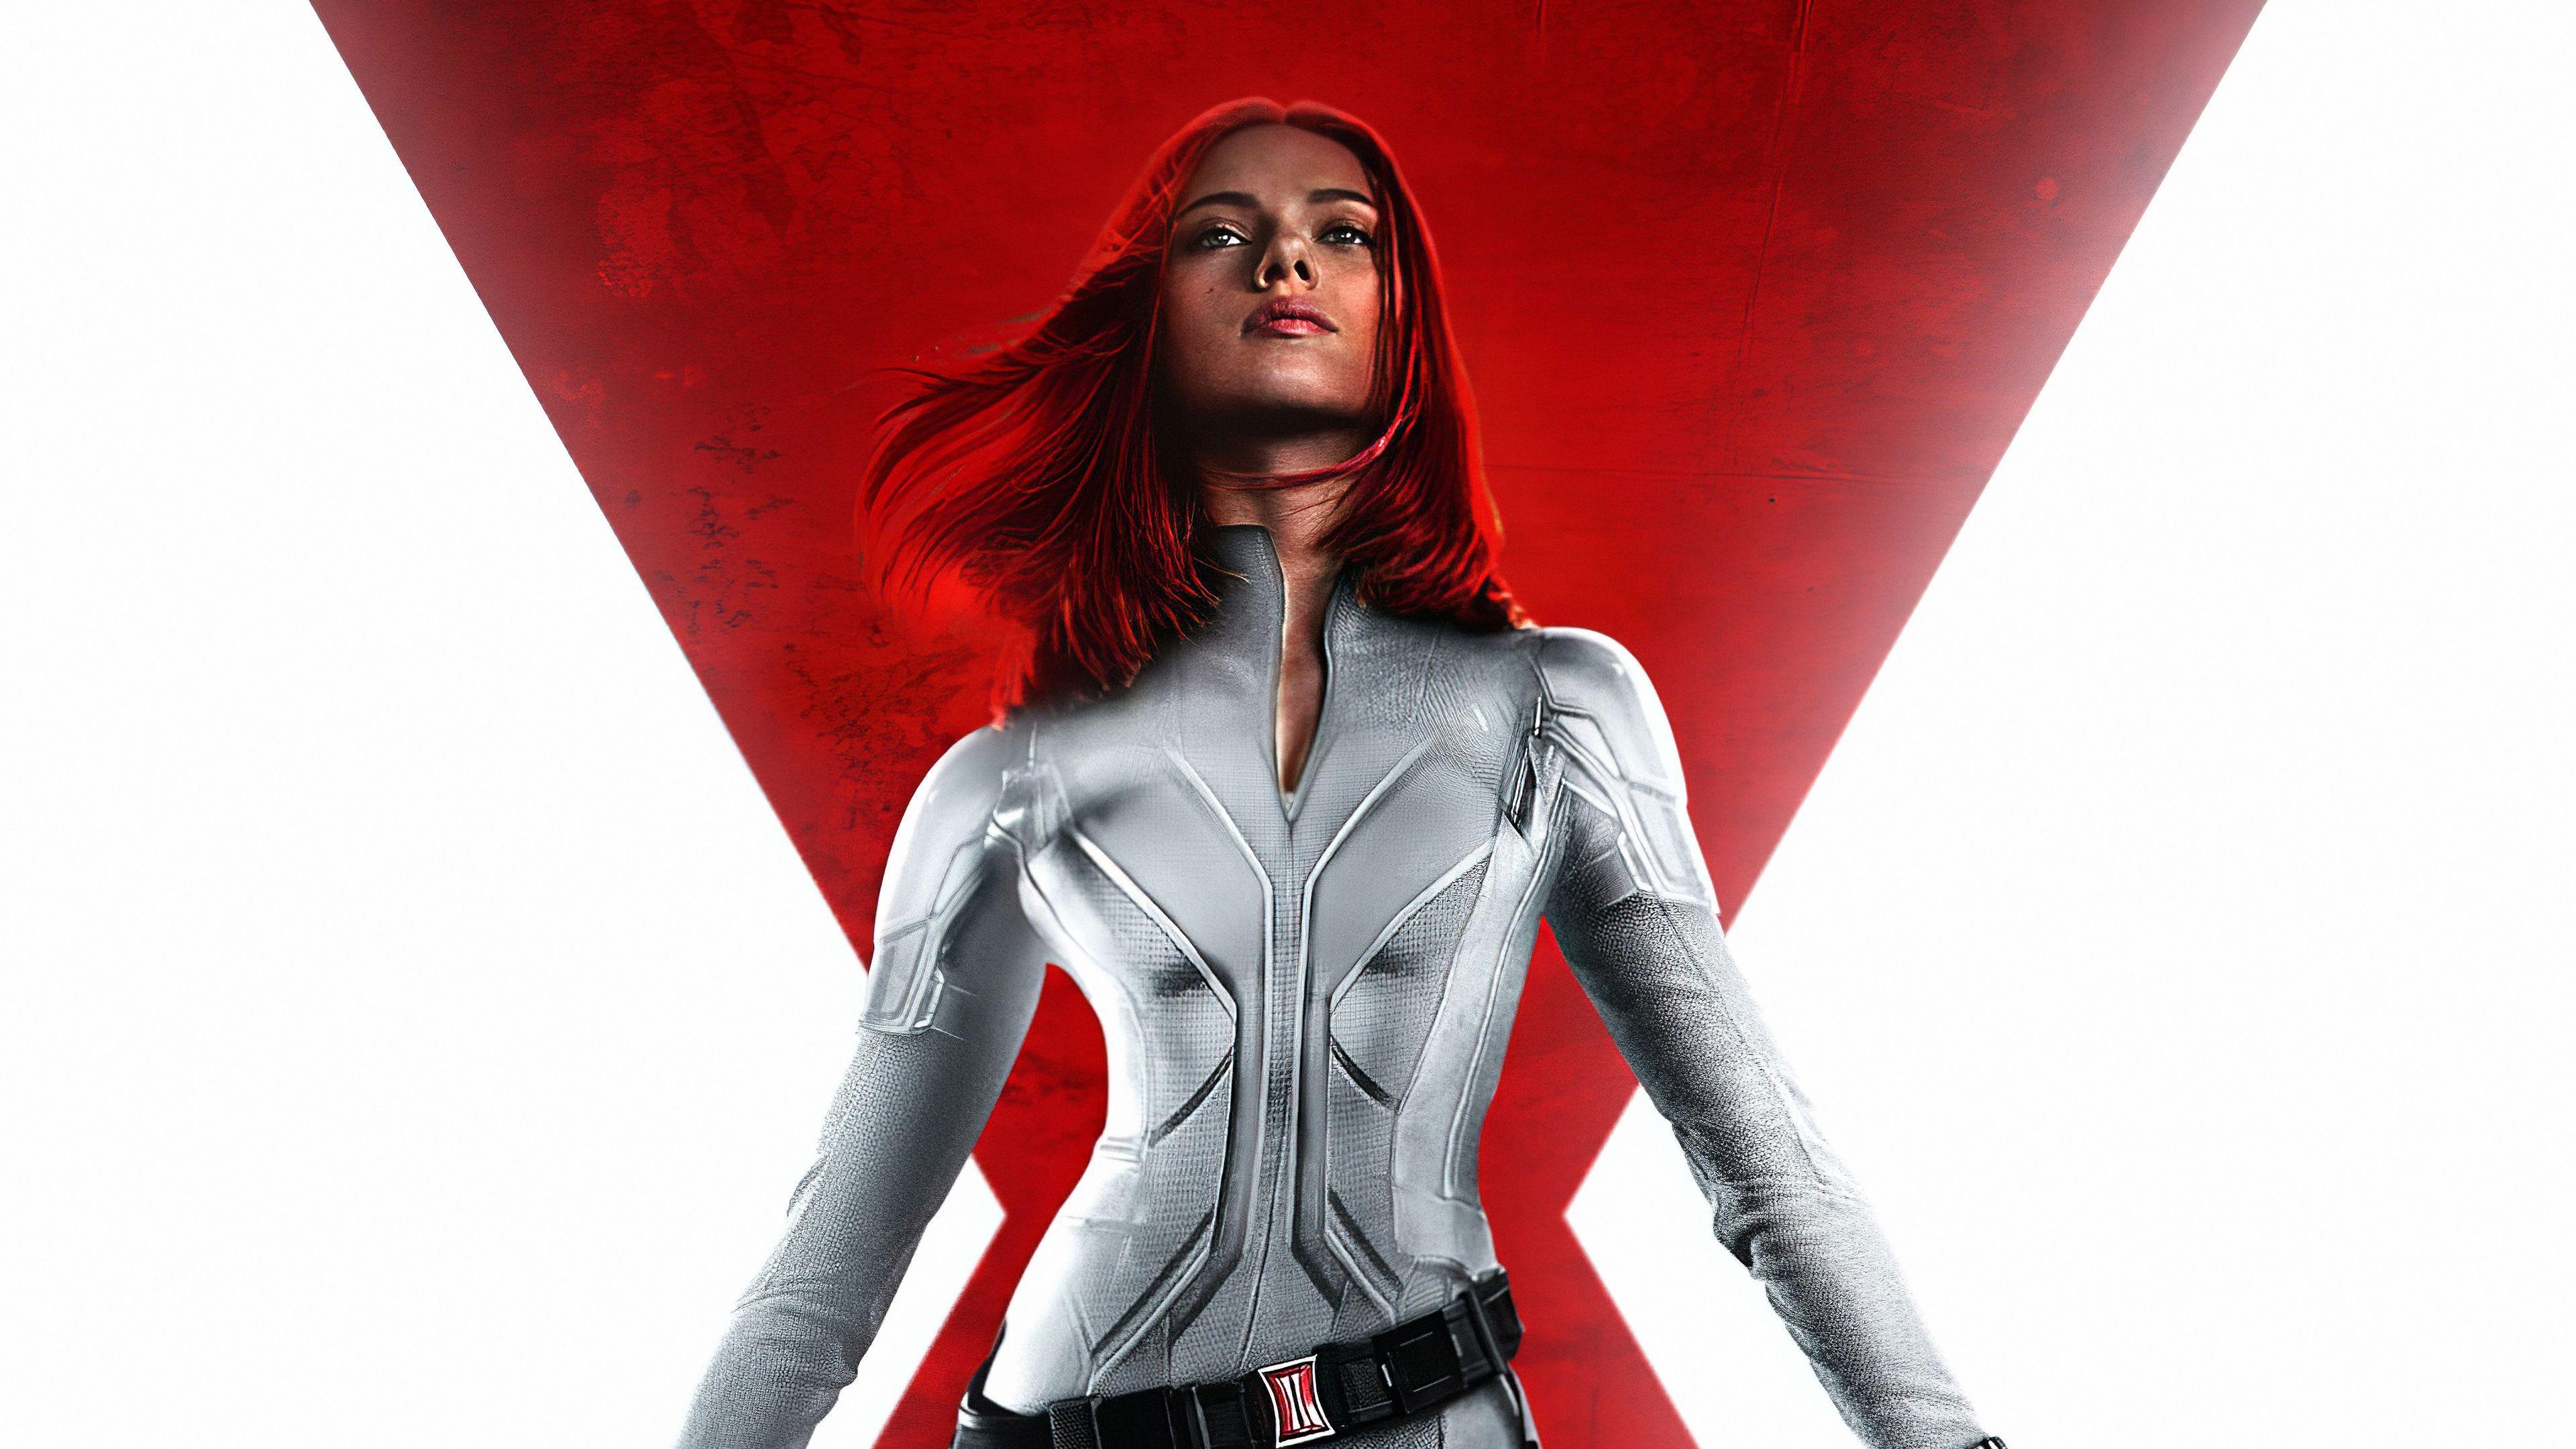 Black Widow Movie Wallpapers Top Free Black Widow Movie Backgrounds Wallpaperaccess